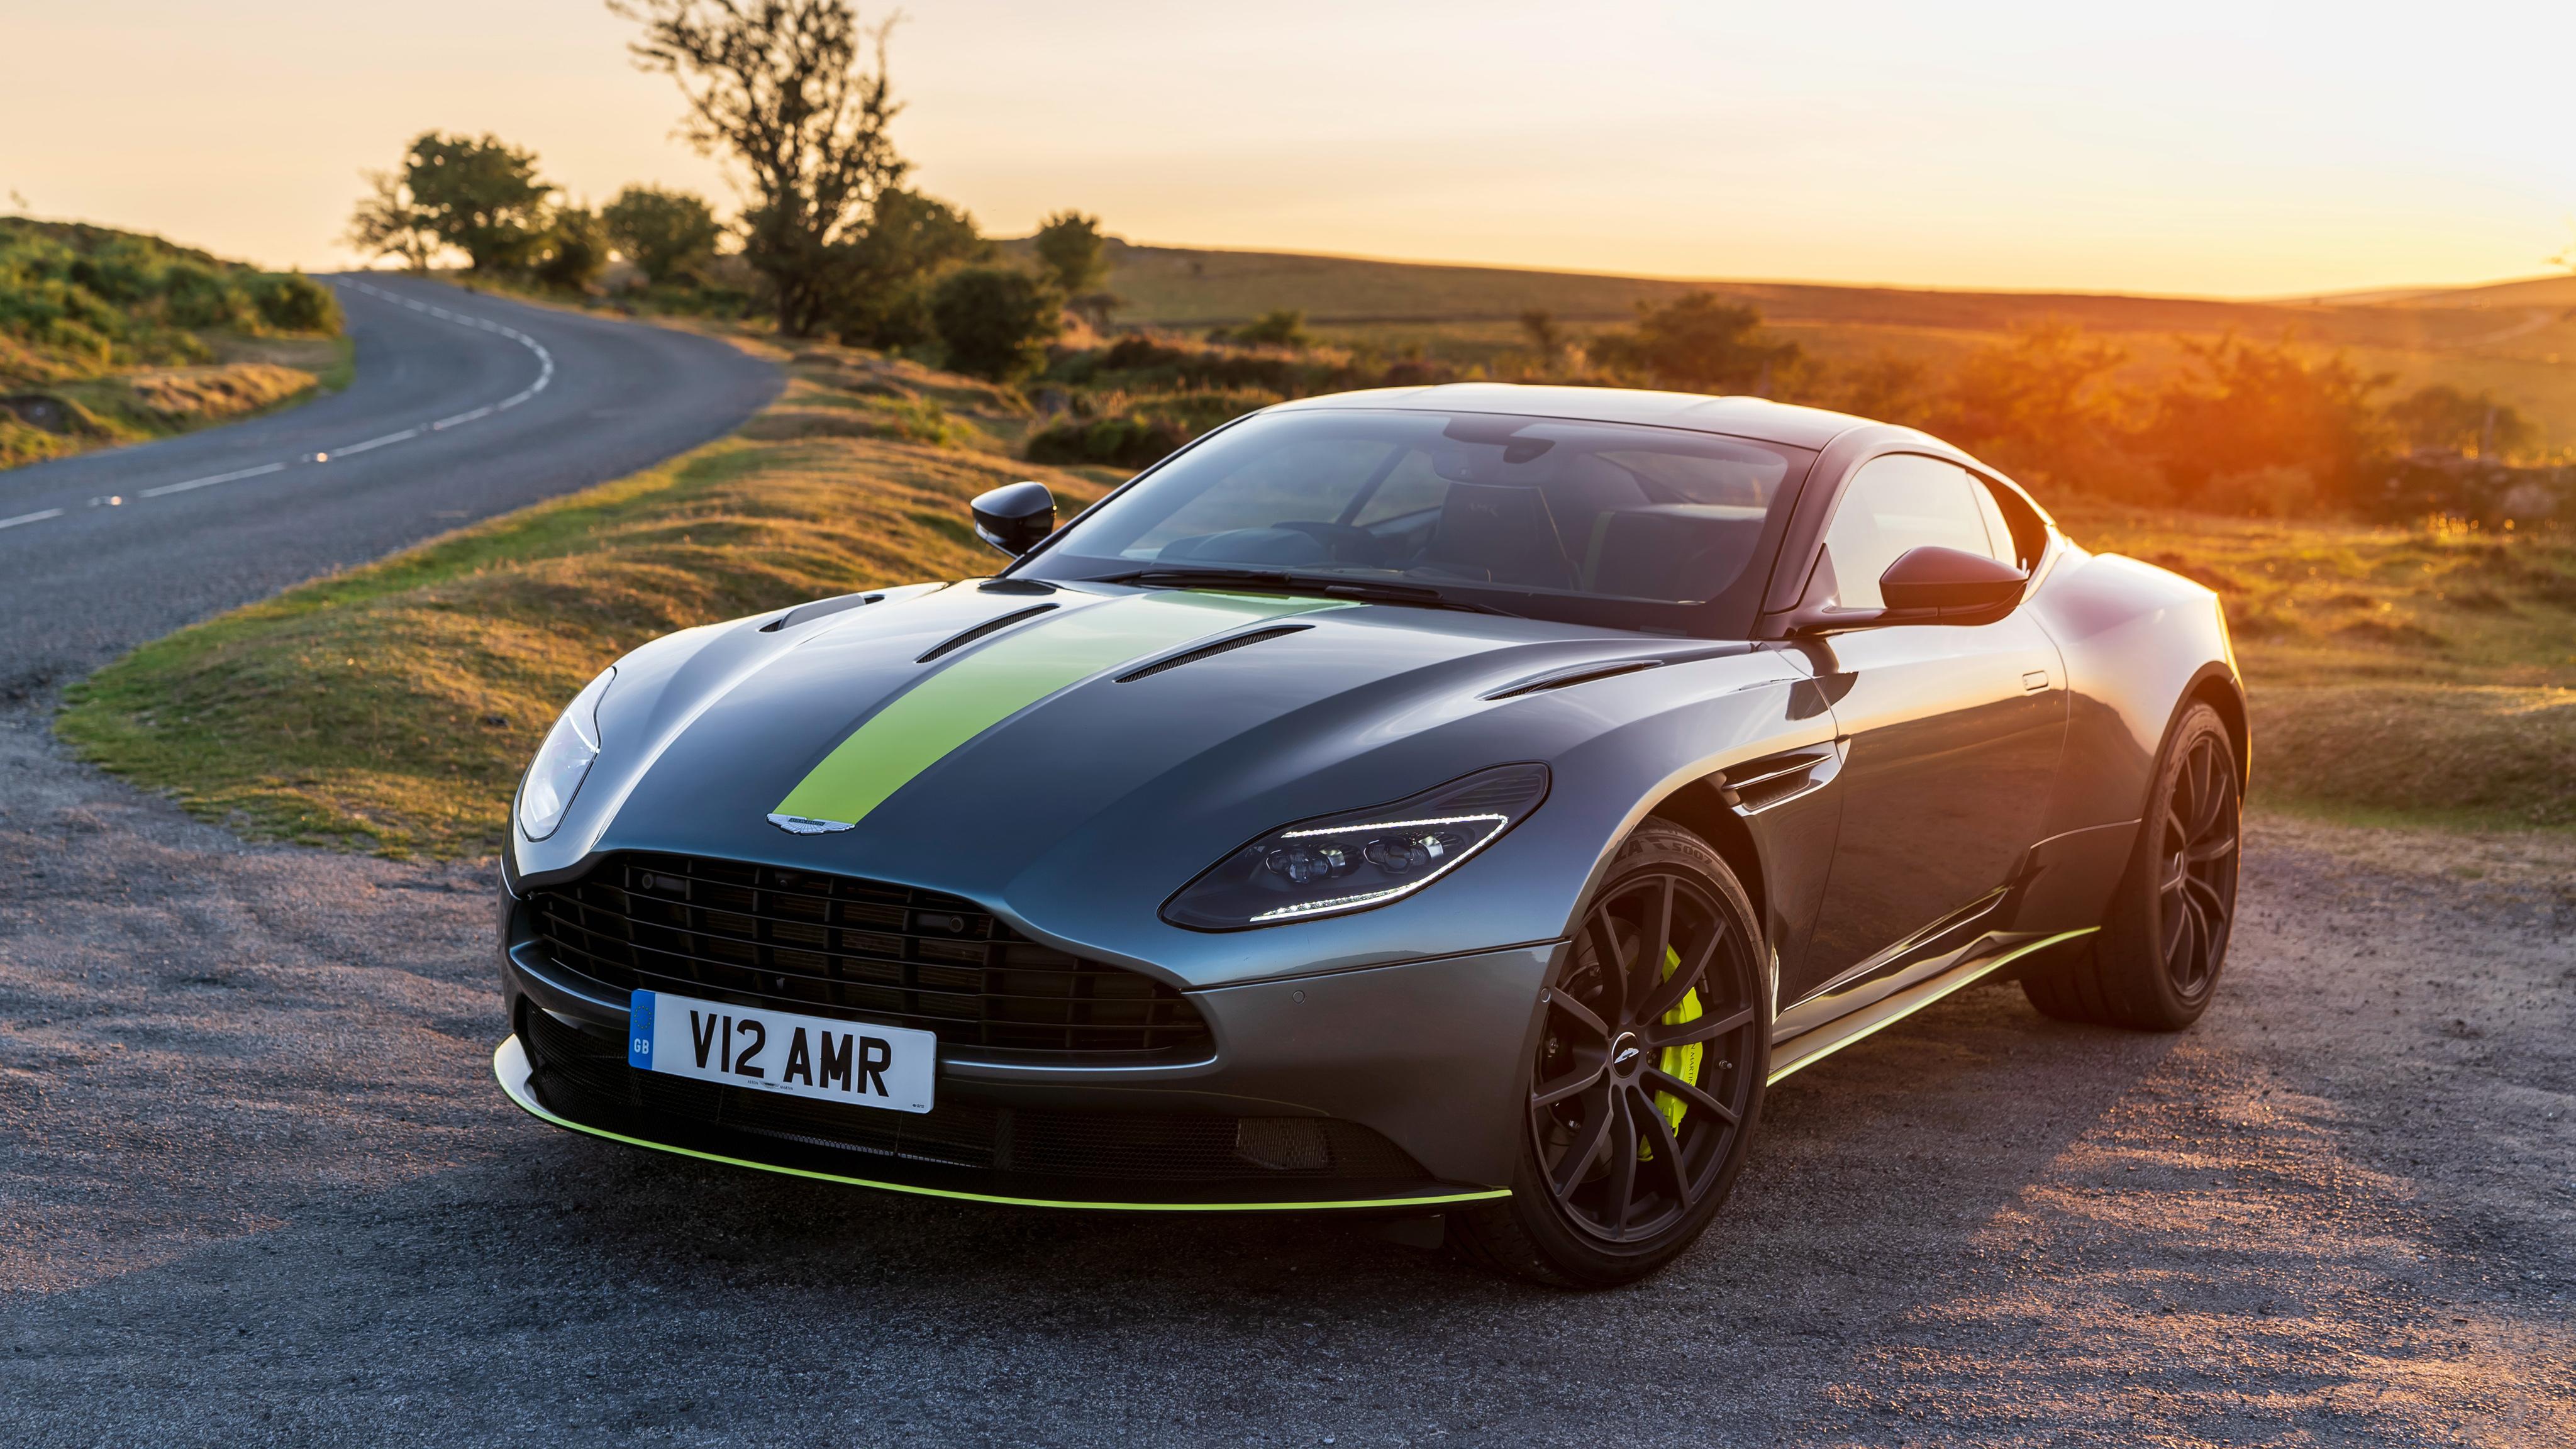 Aston Martin Db11 Amr Signature Edition 2018 4k Wallpaper